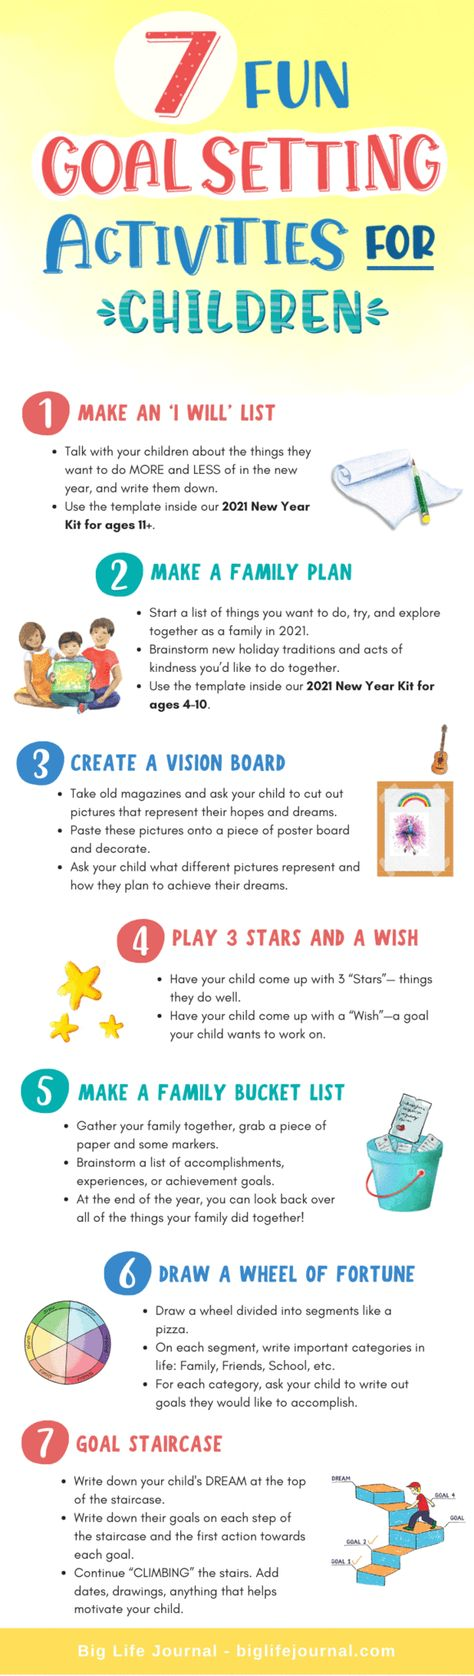 7 Fun Goal Setting Activities for Children